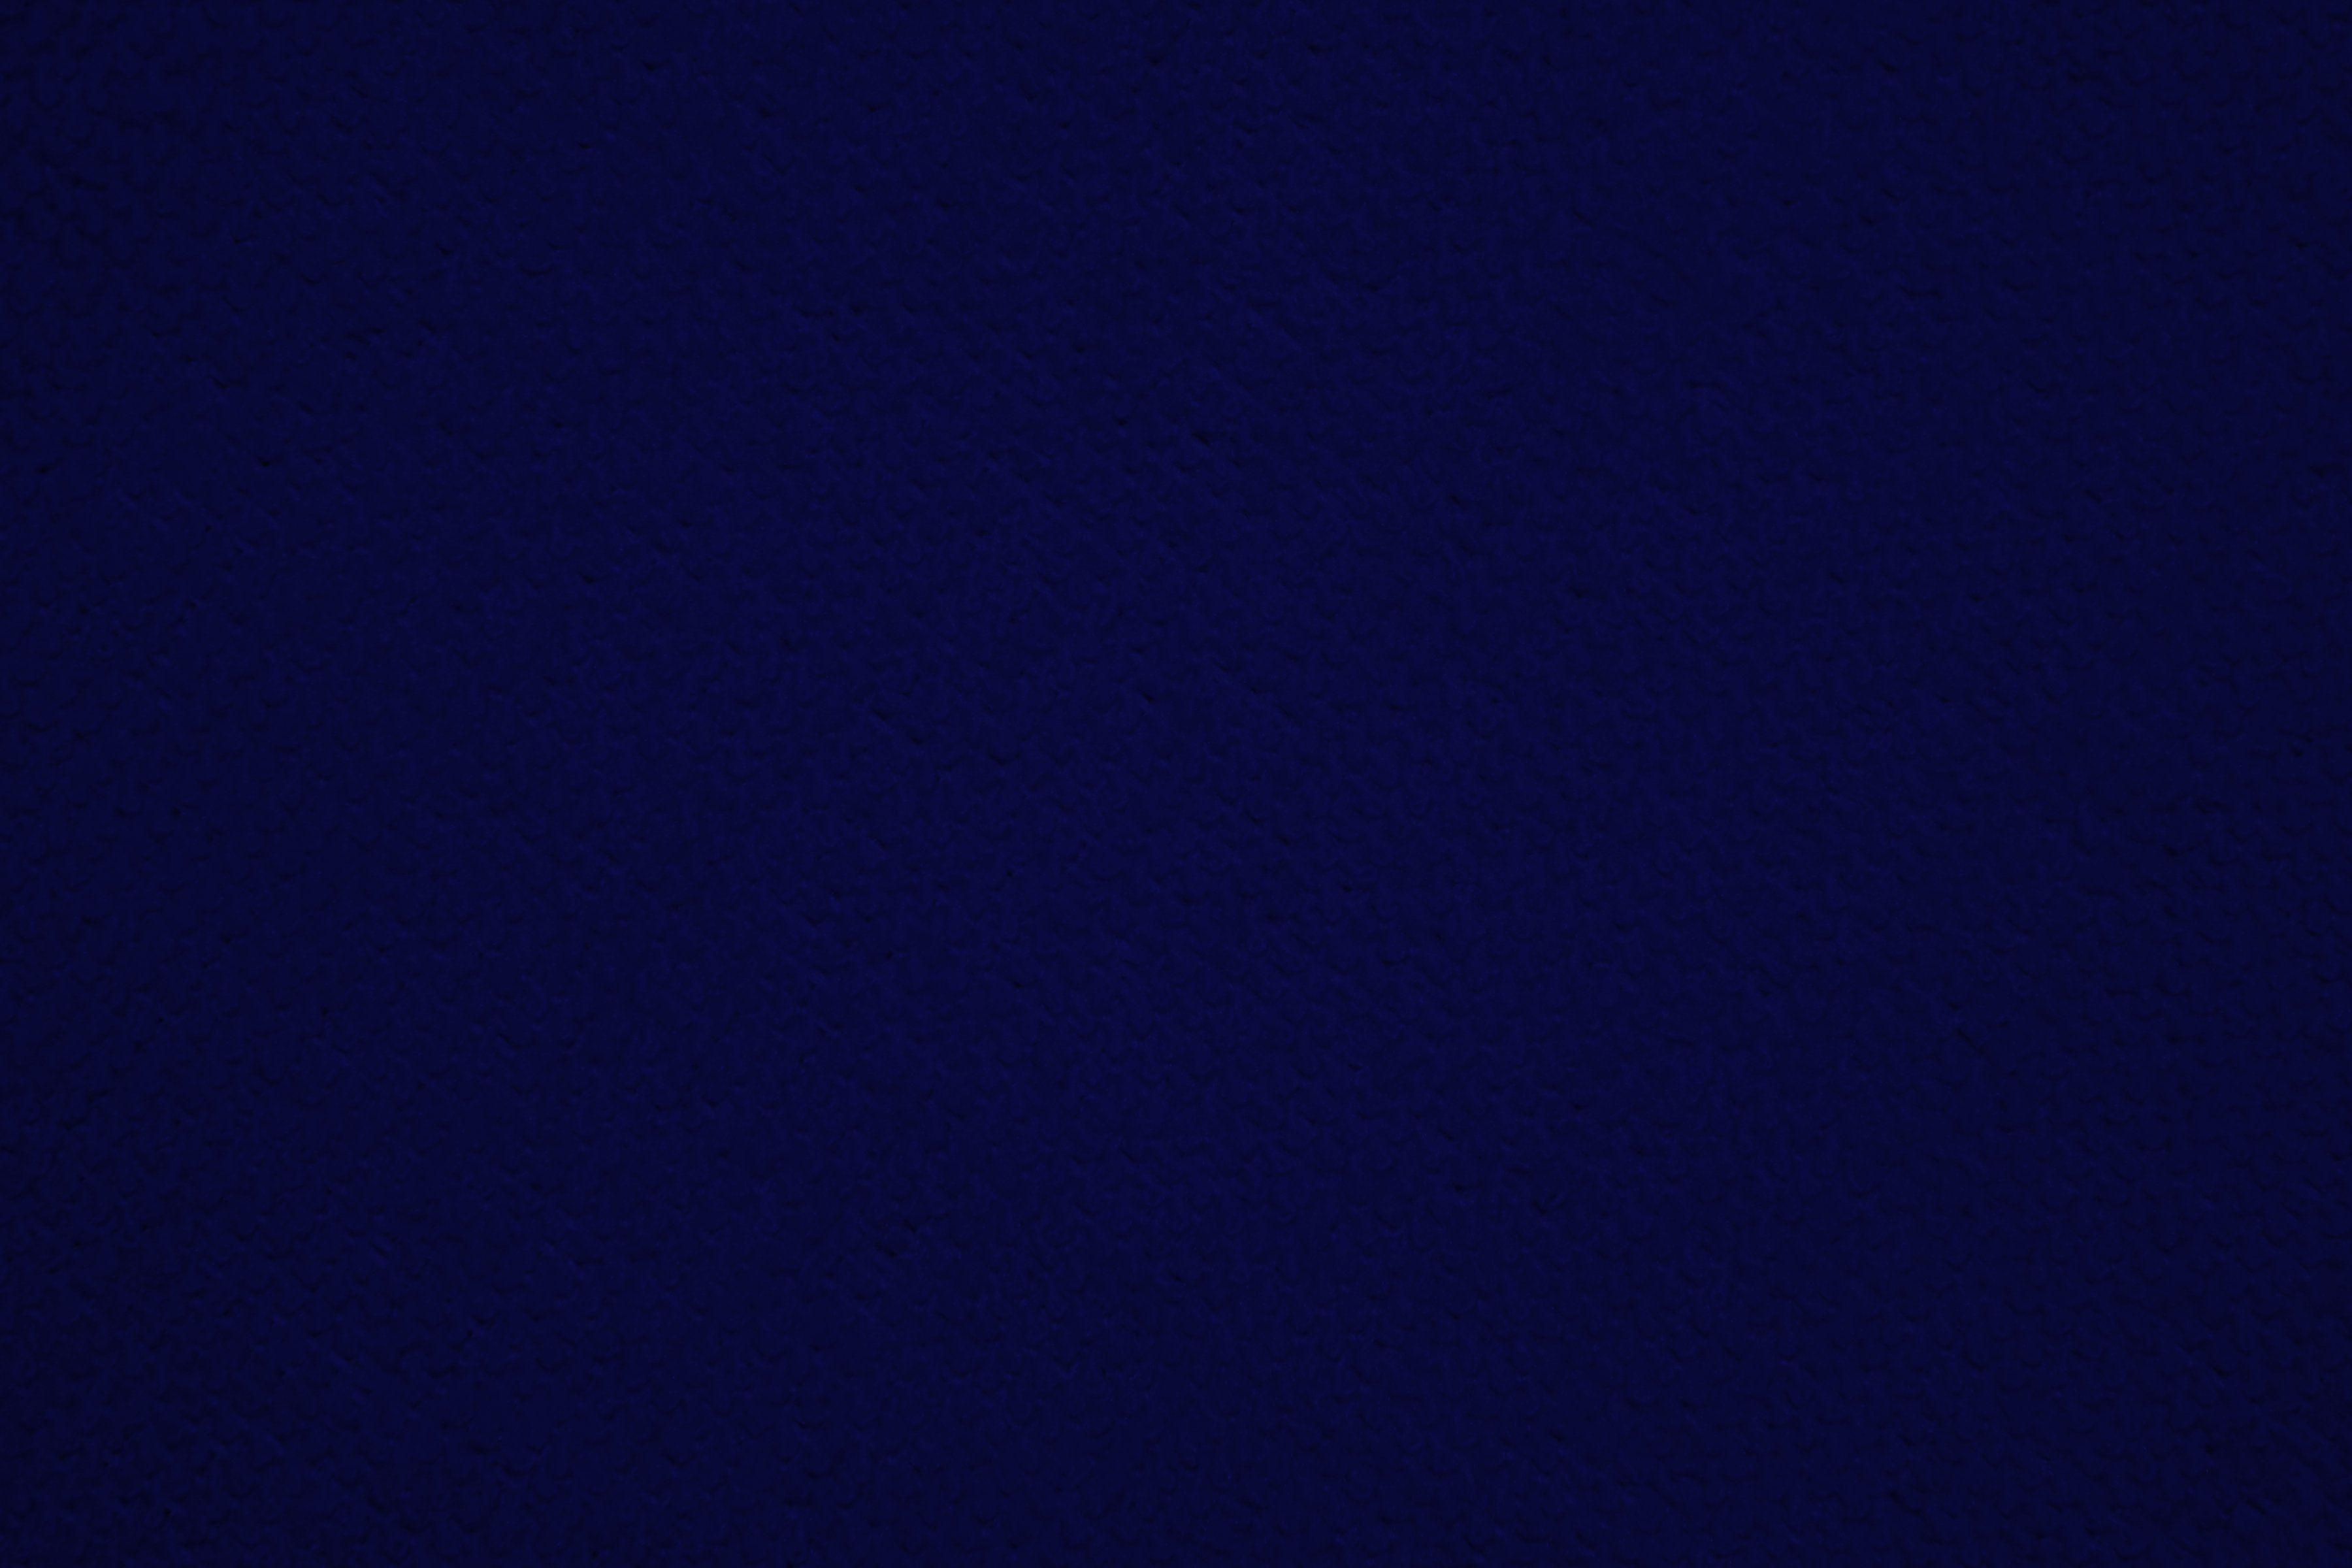 Dark Blue Color Wallpapers Wallpaper Cave